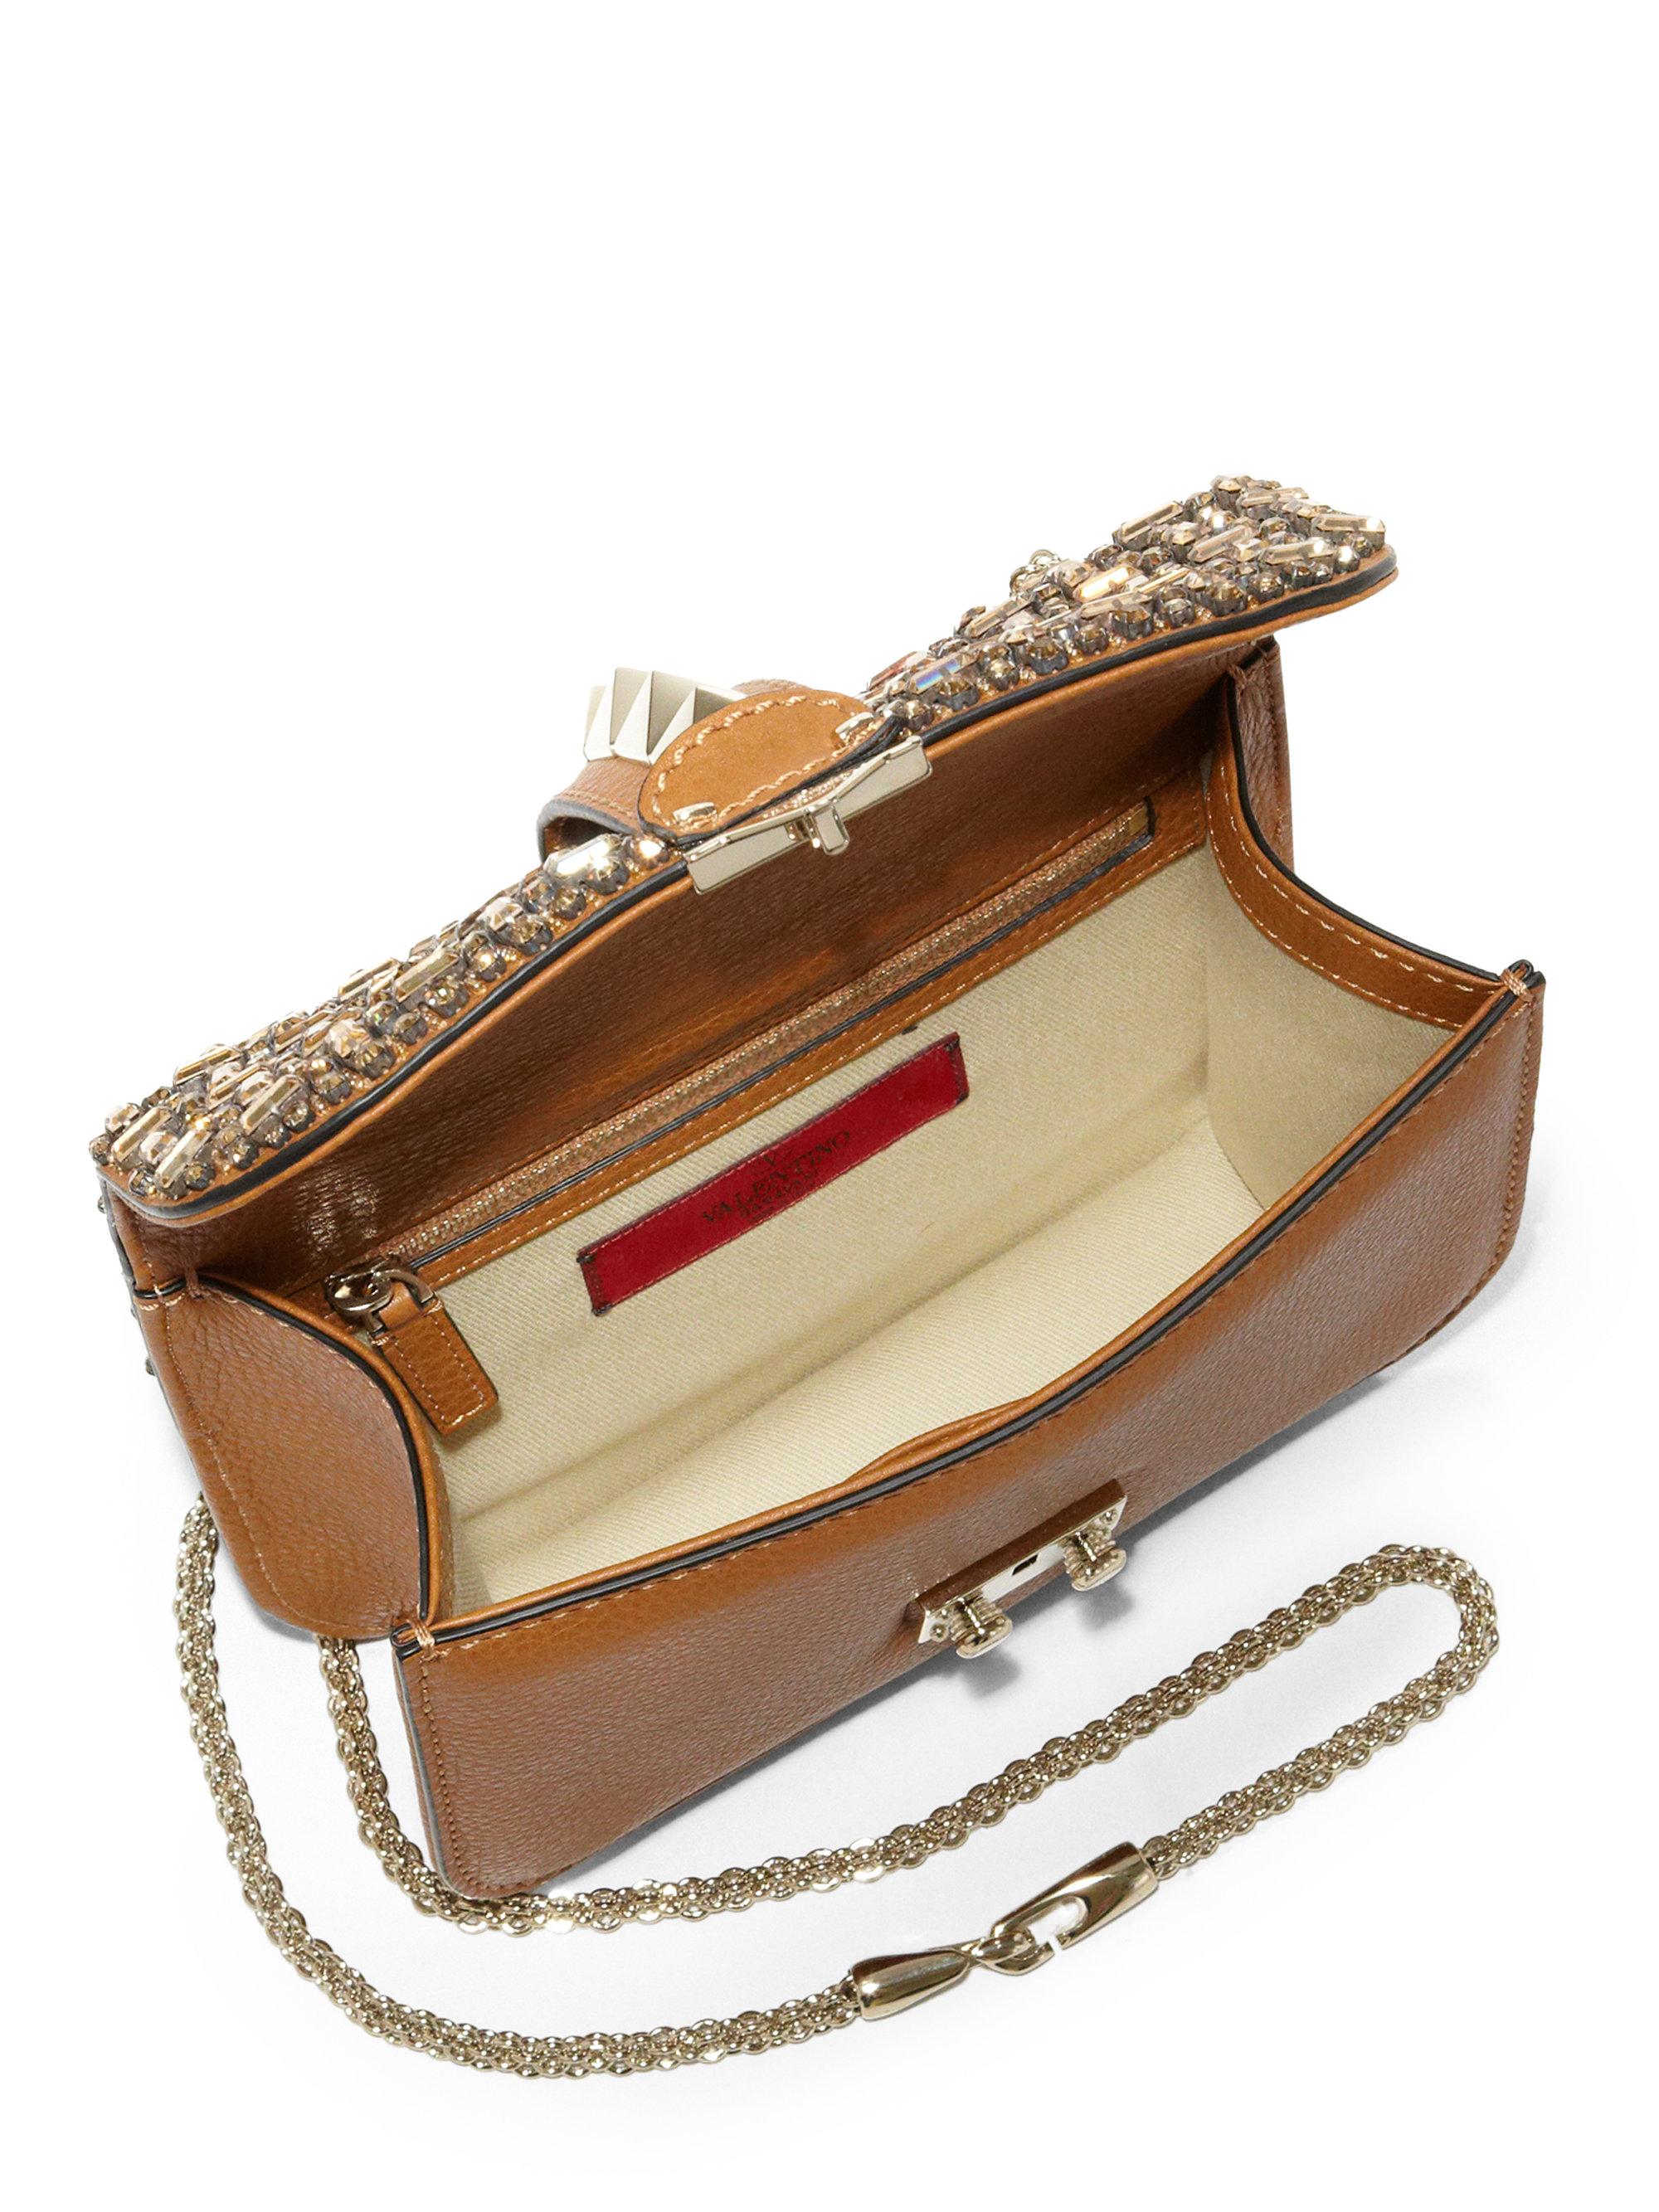 chloe elsie small shoulder bag - chloe padlock-embellished textured leather paddington bag, chloe ...